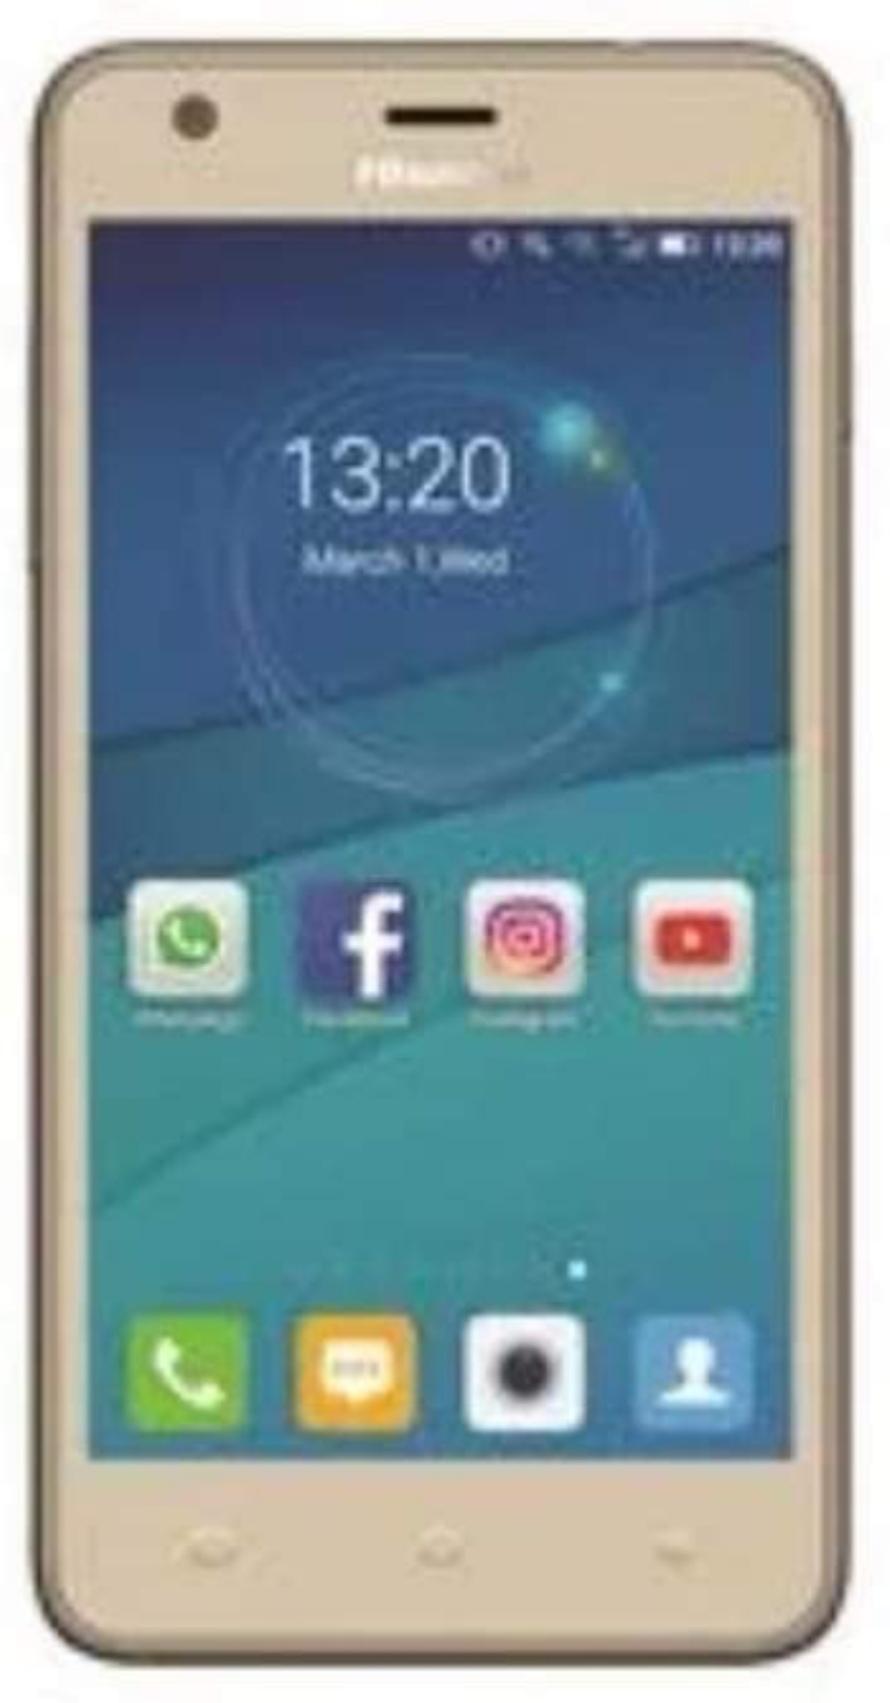 Hisense U962 smart phone